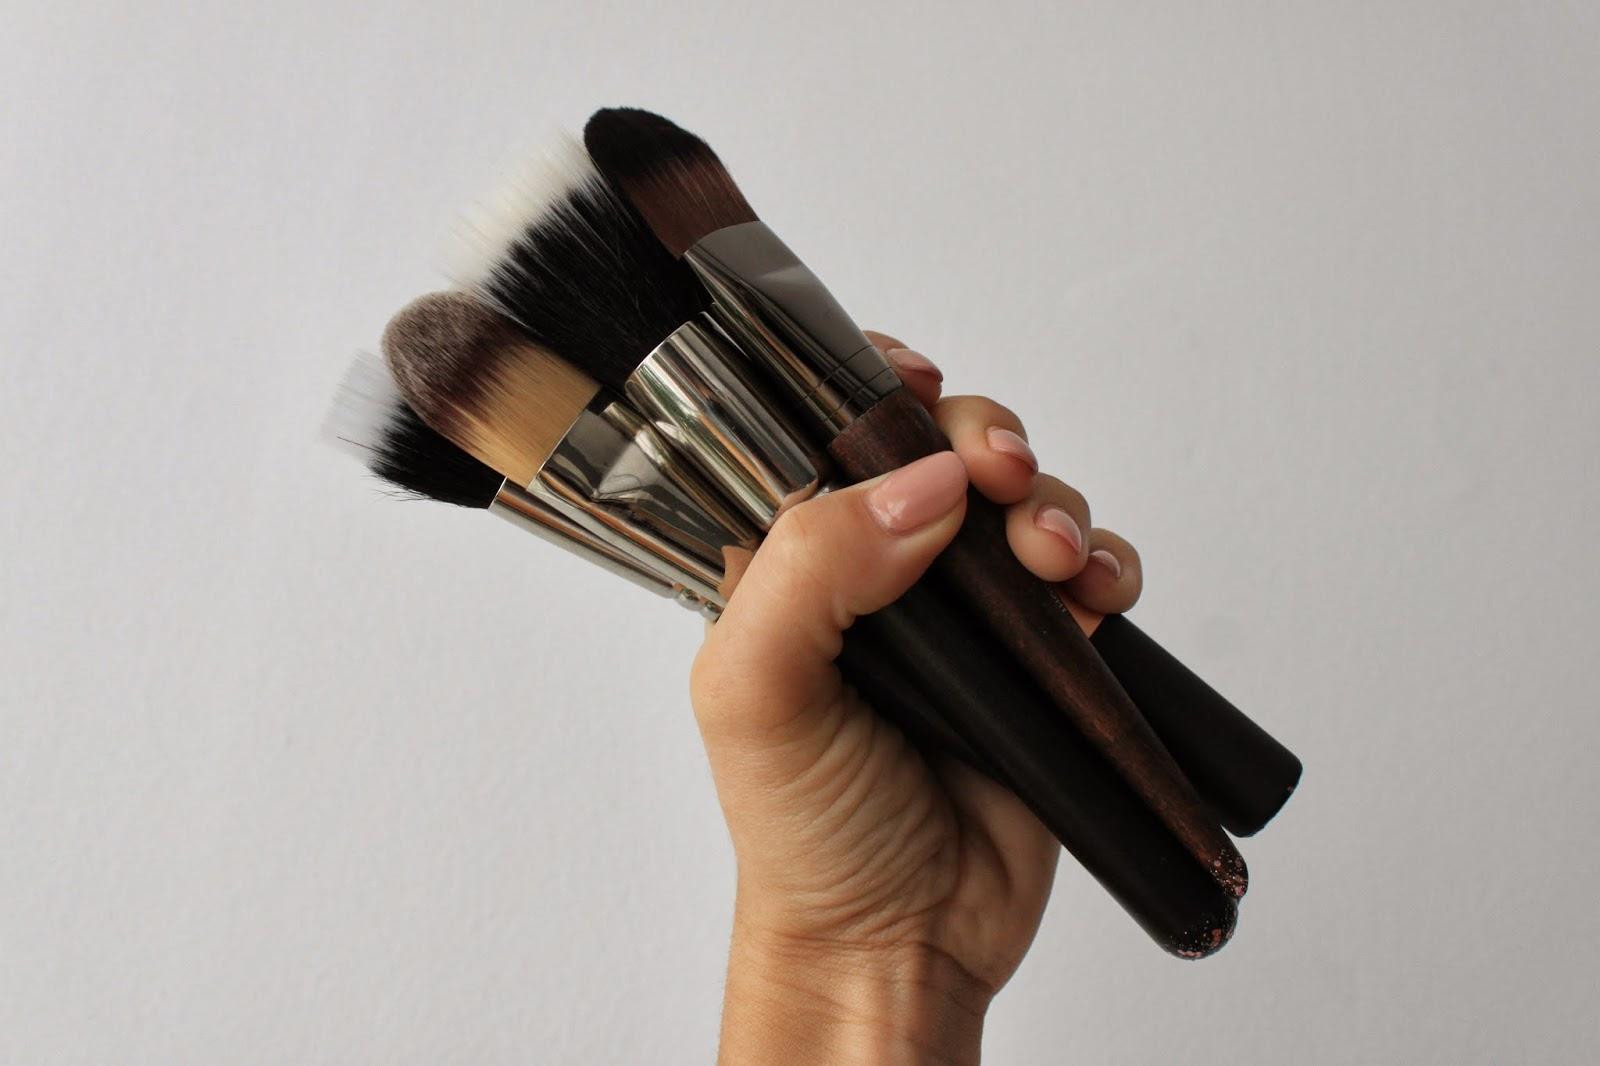 Mis Pinceles Favoritos - Bases de Maquillaje